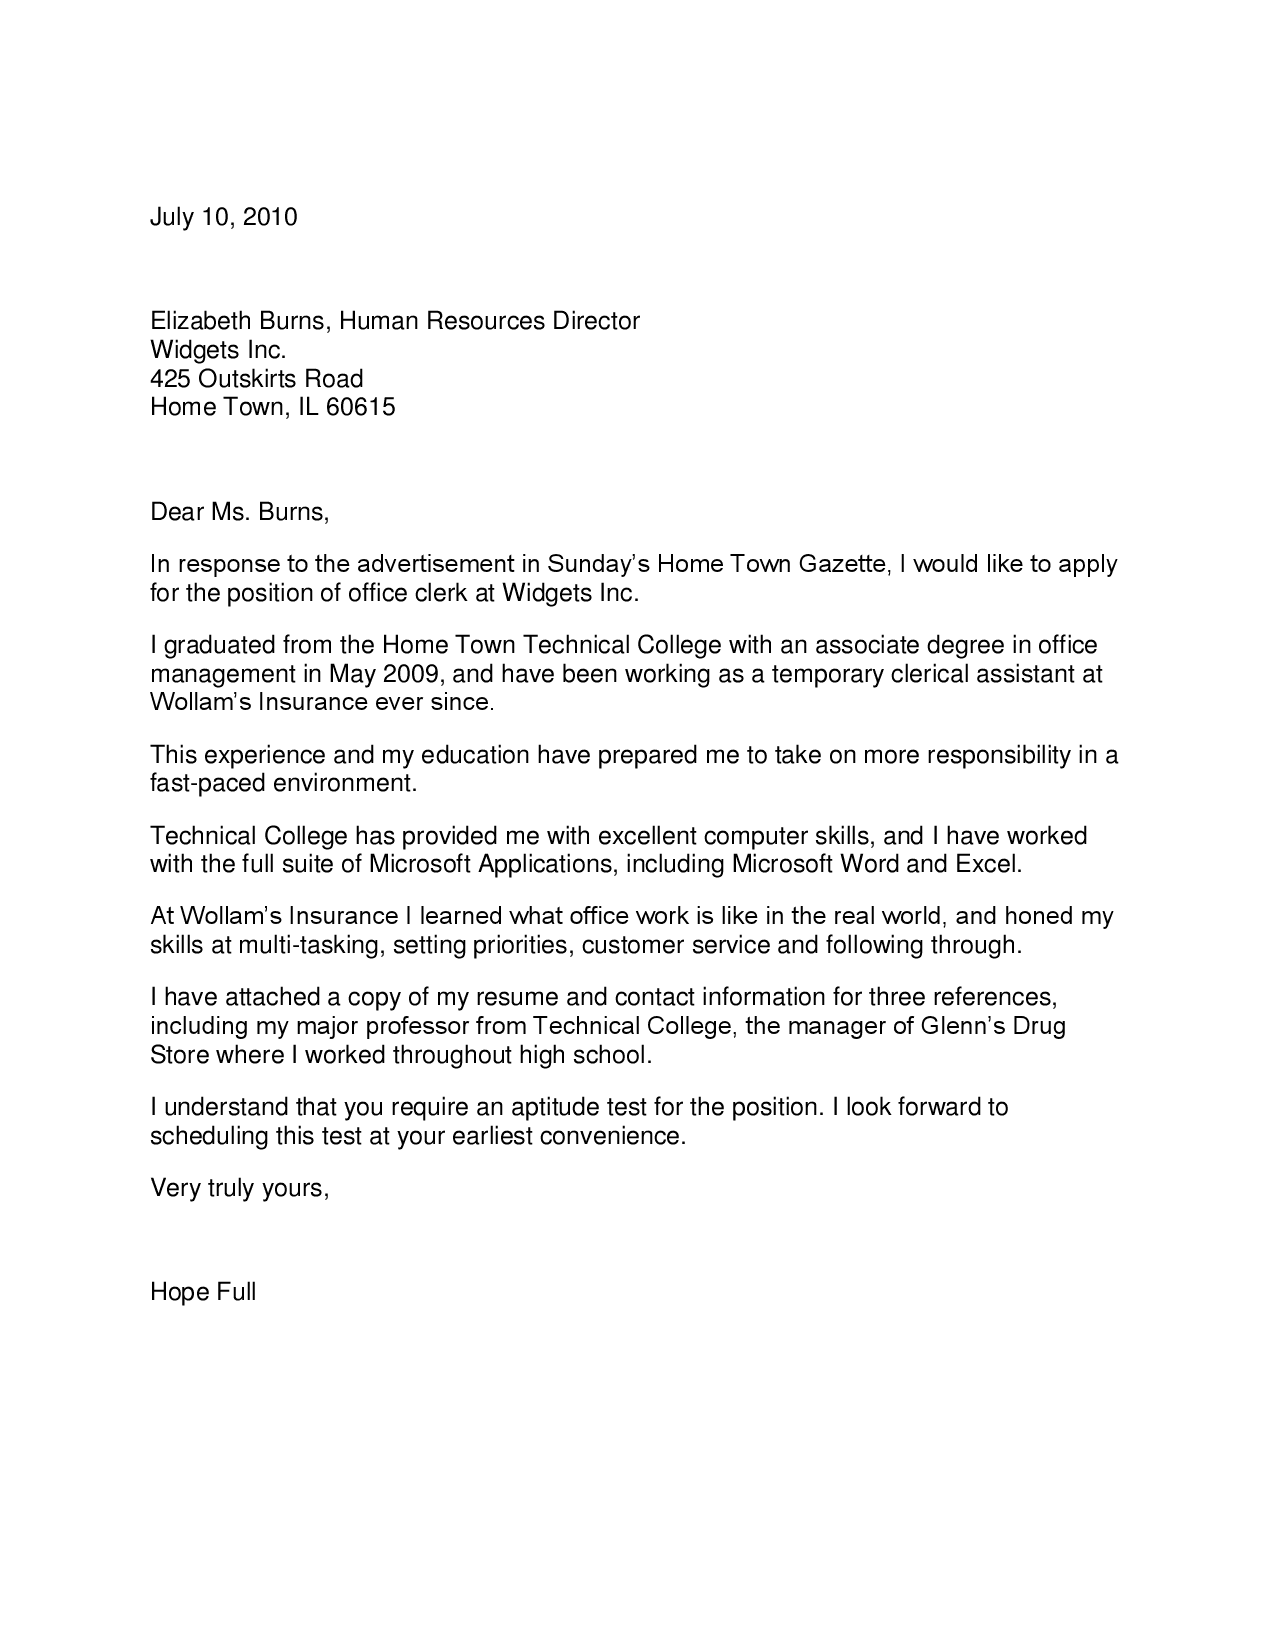 Accounting Finance Cover Letter Samples Resume Genius AppTiled Com Unique  App Finder Engine Latest Reviews Market